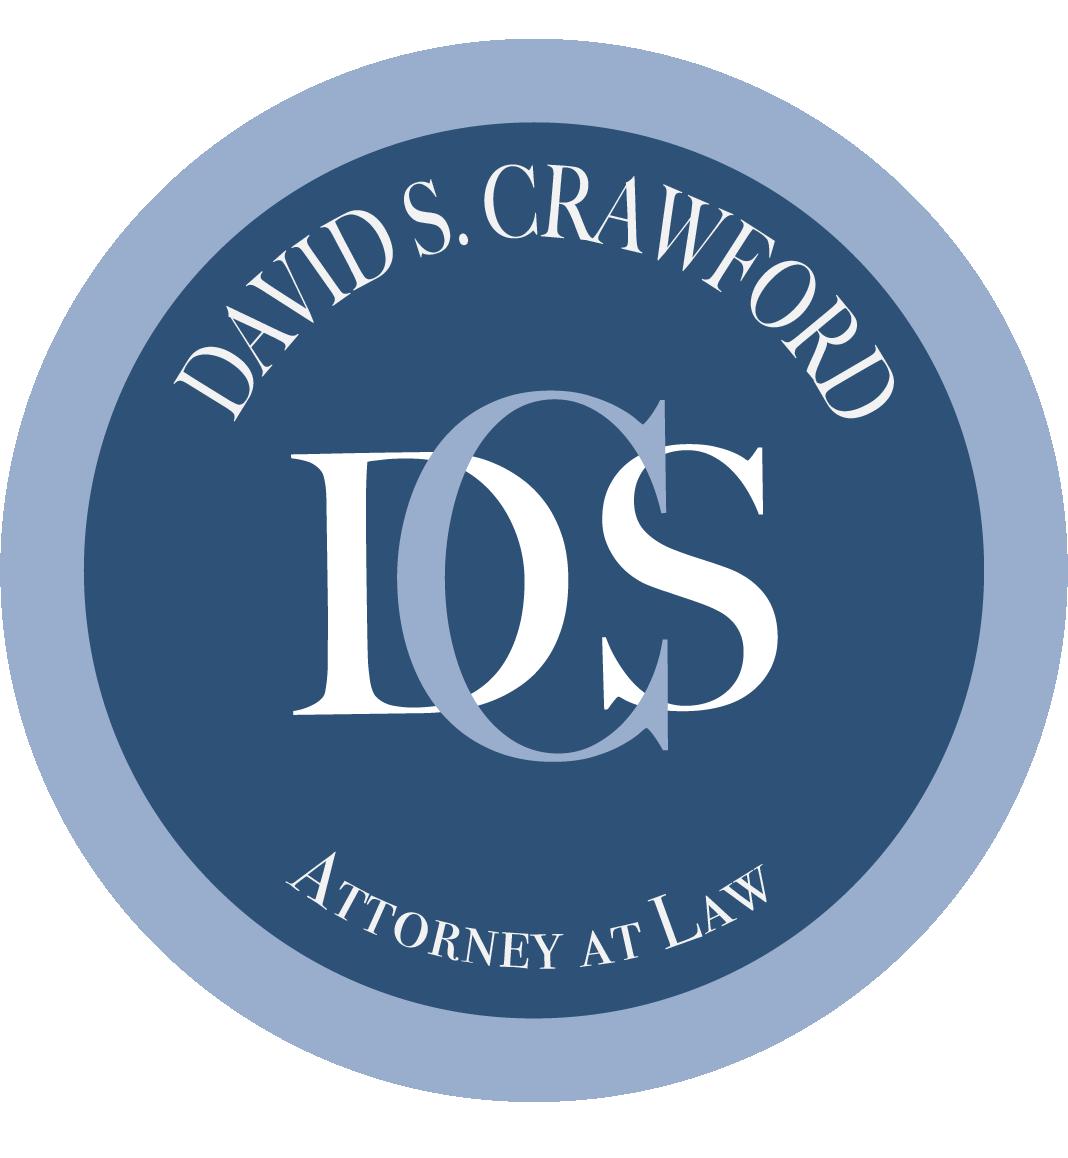 David Crawford, Esq.